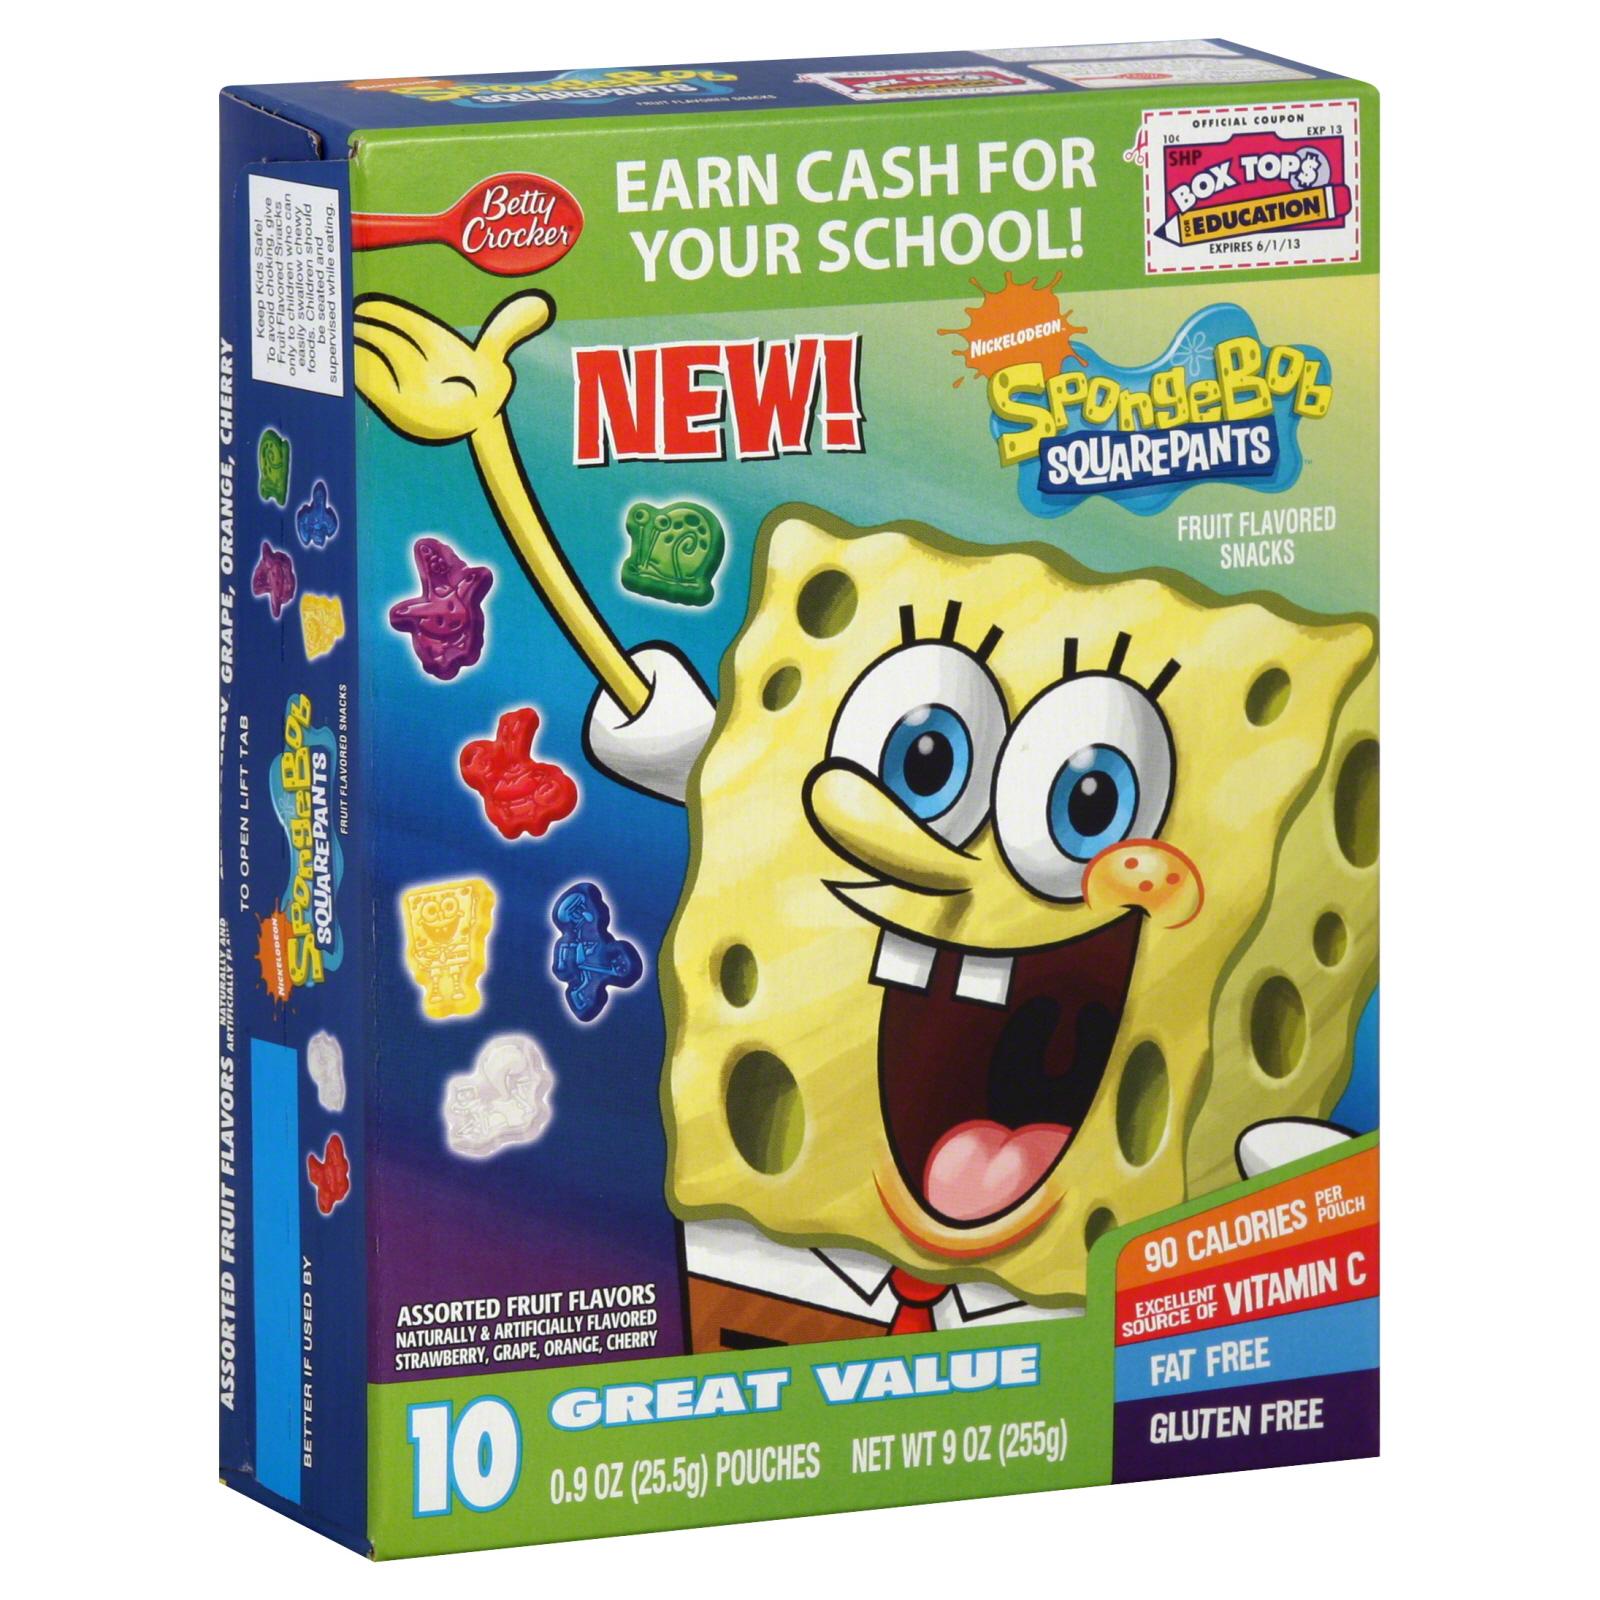 Betty Crocker Fruit Flavored Snacks Nickelodeon SpongeBob